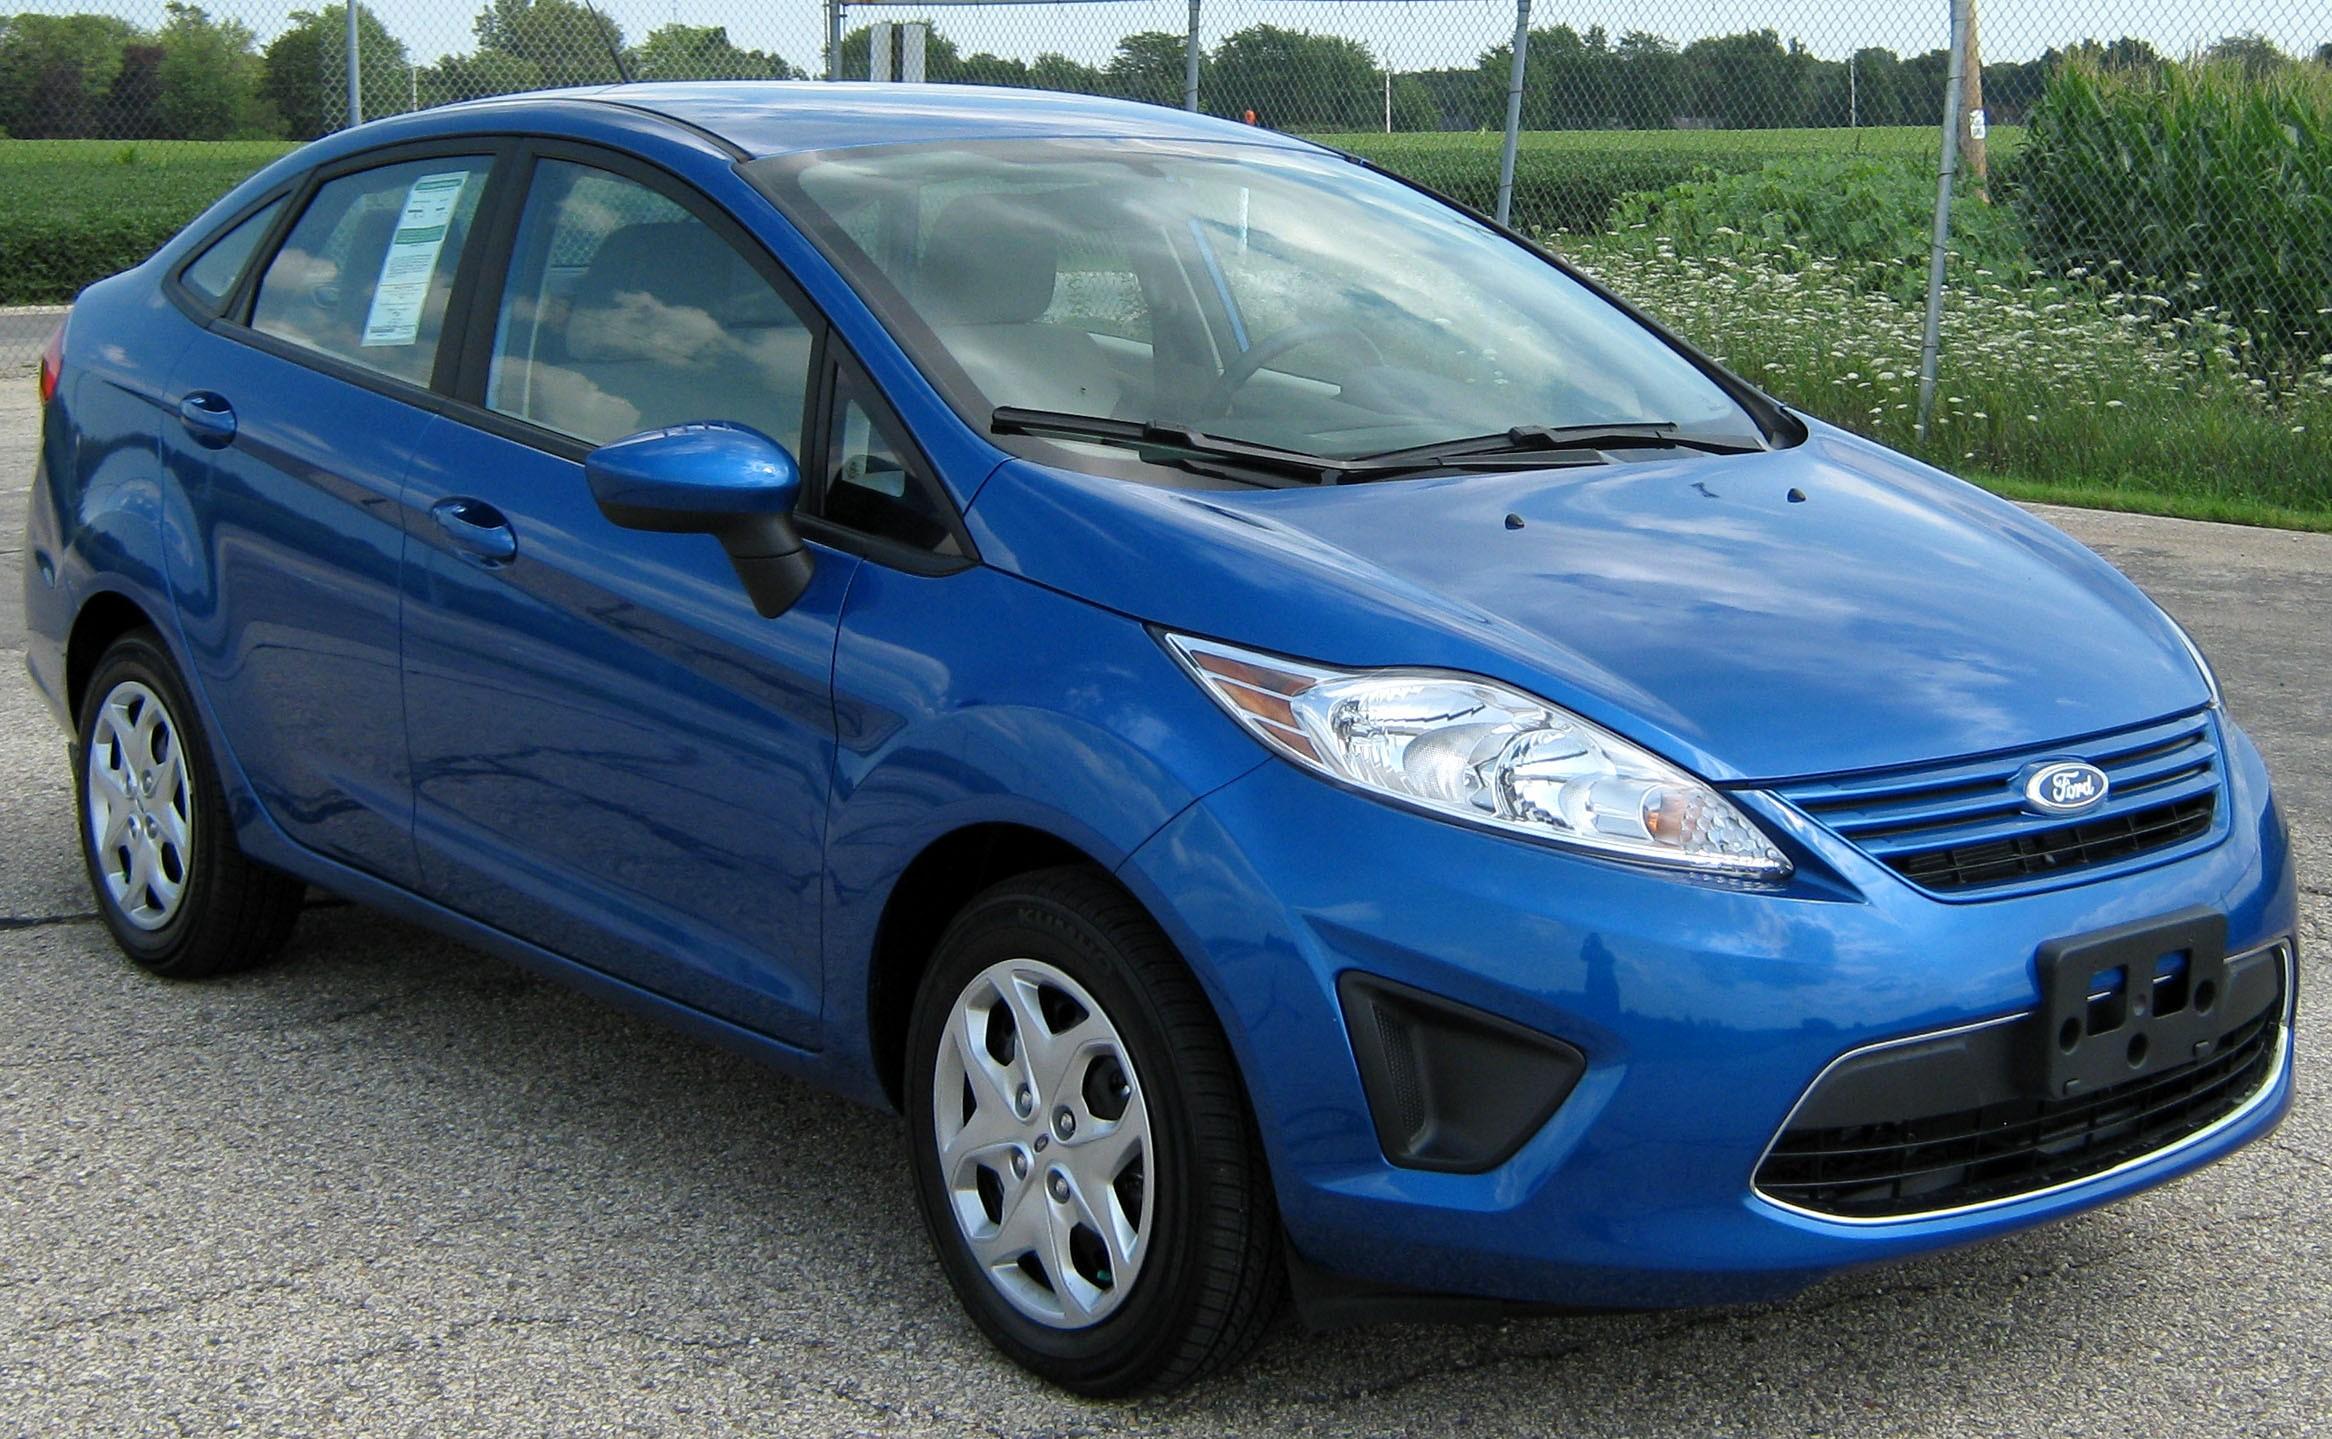 Ford презентует обновленную Fiesta до конца года